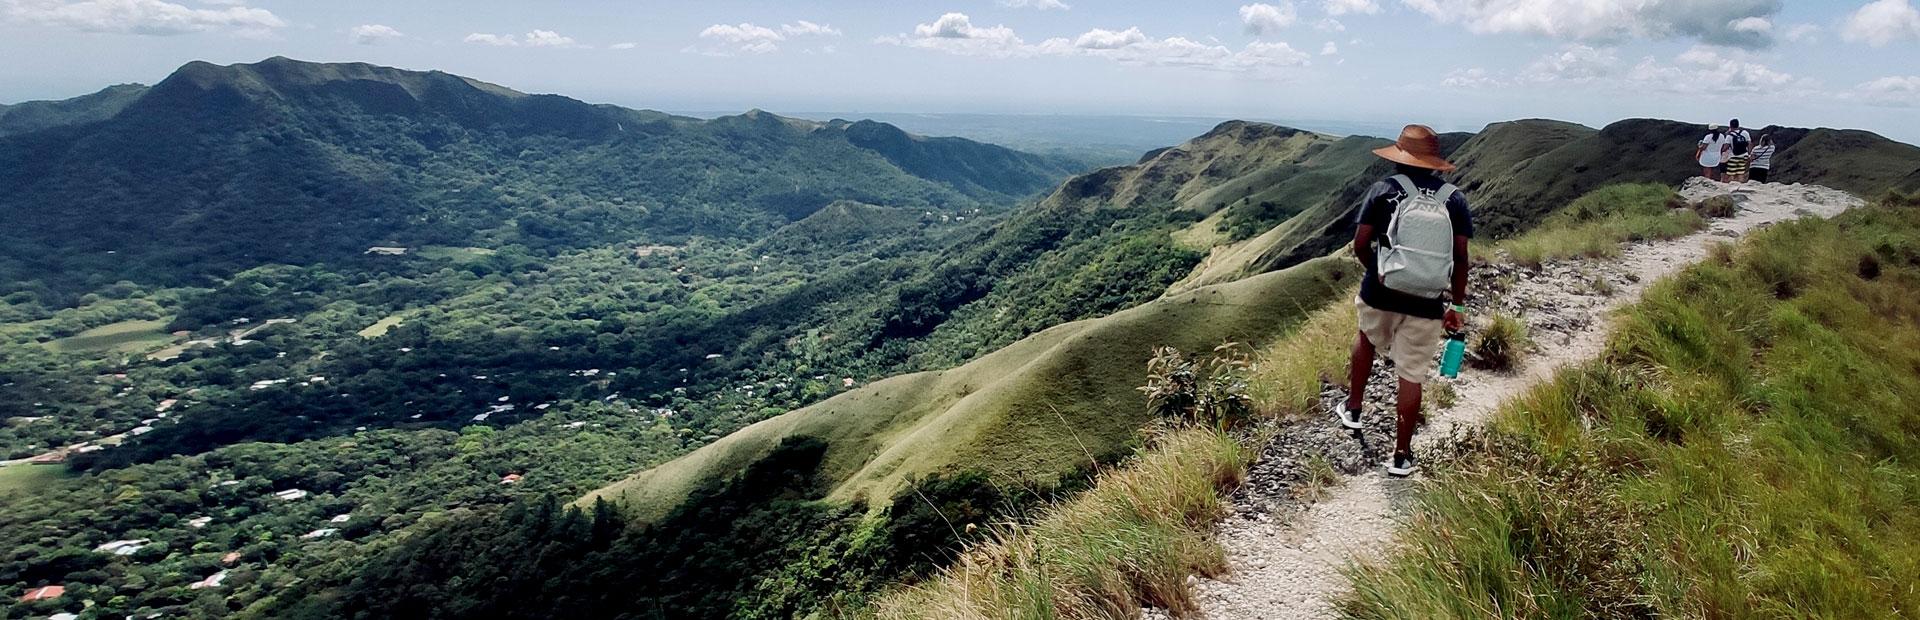 Panama Urlaub mit Costa Rica Reise kombinieren